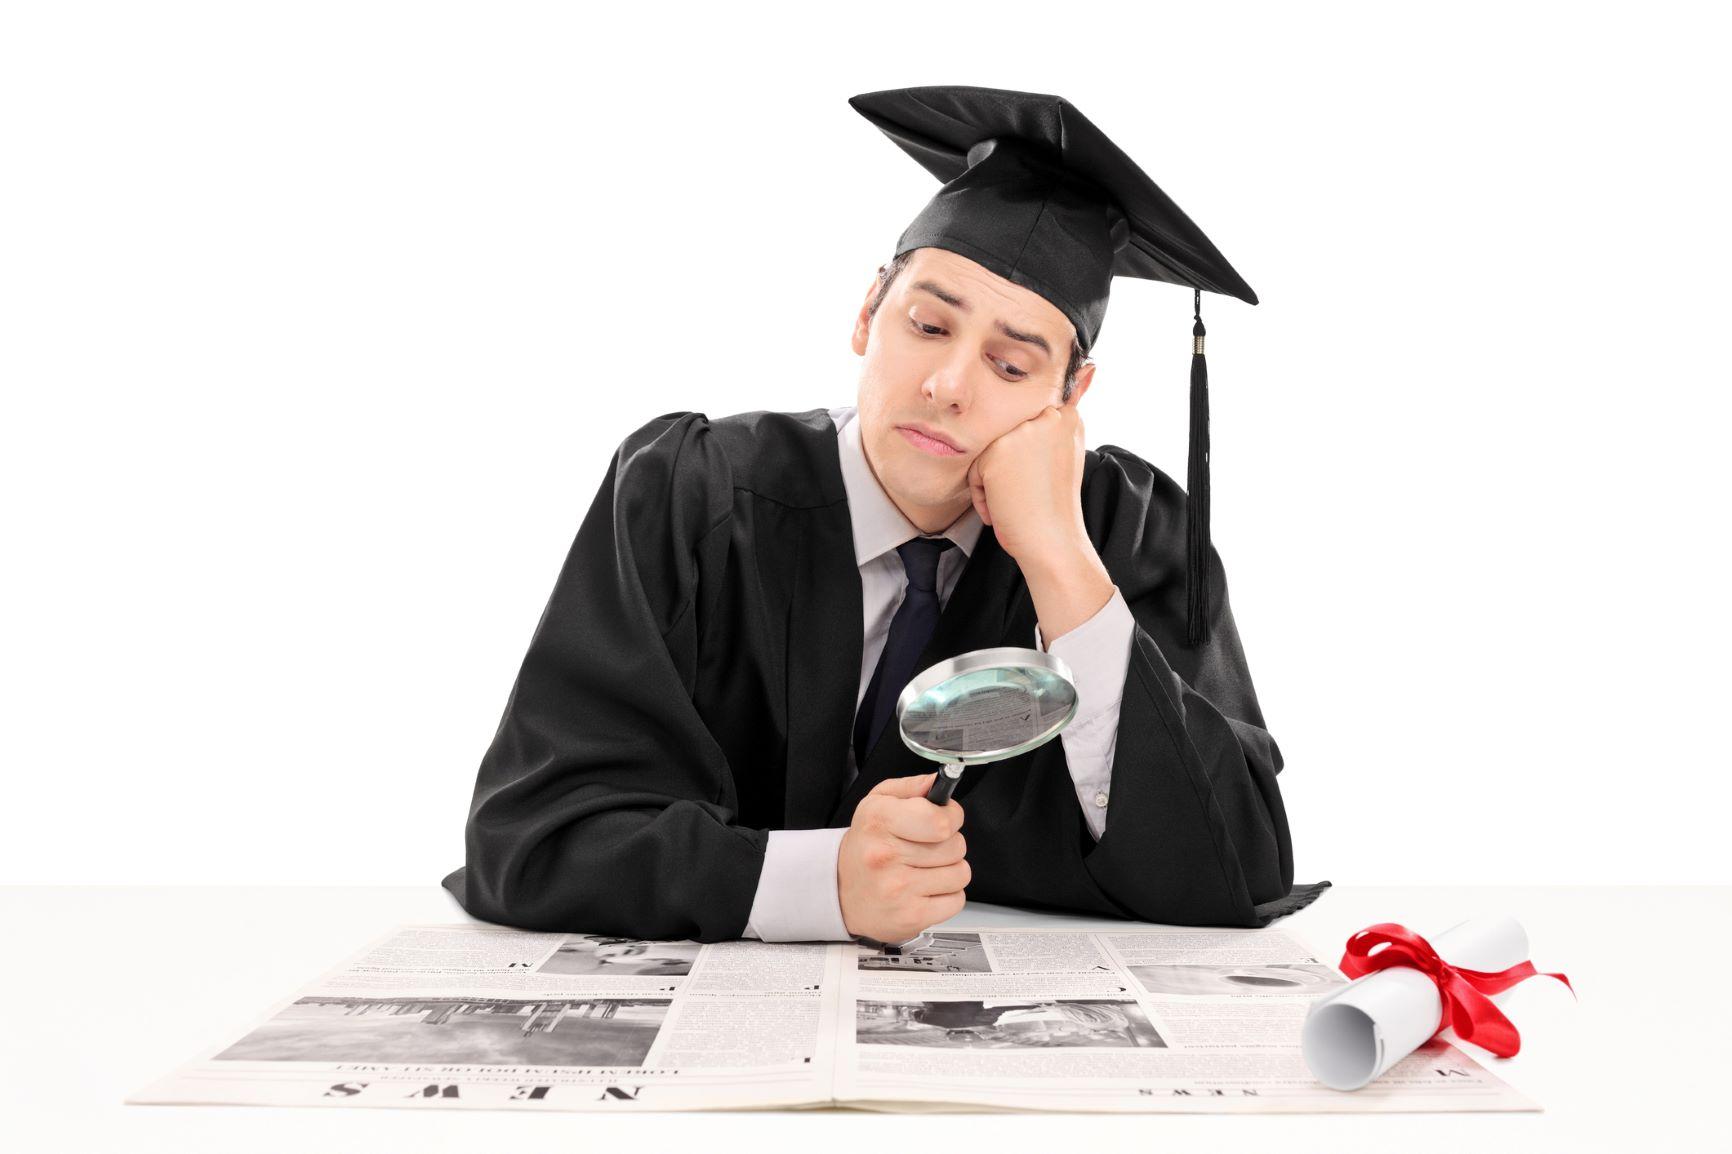 Graduate Job Searching